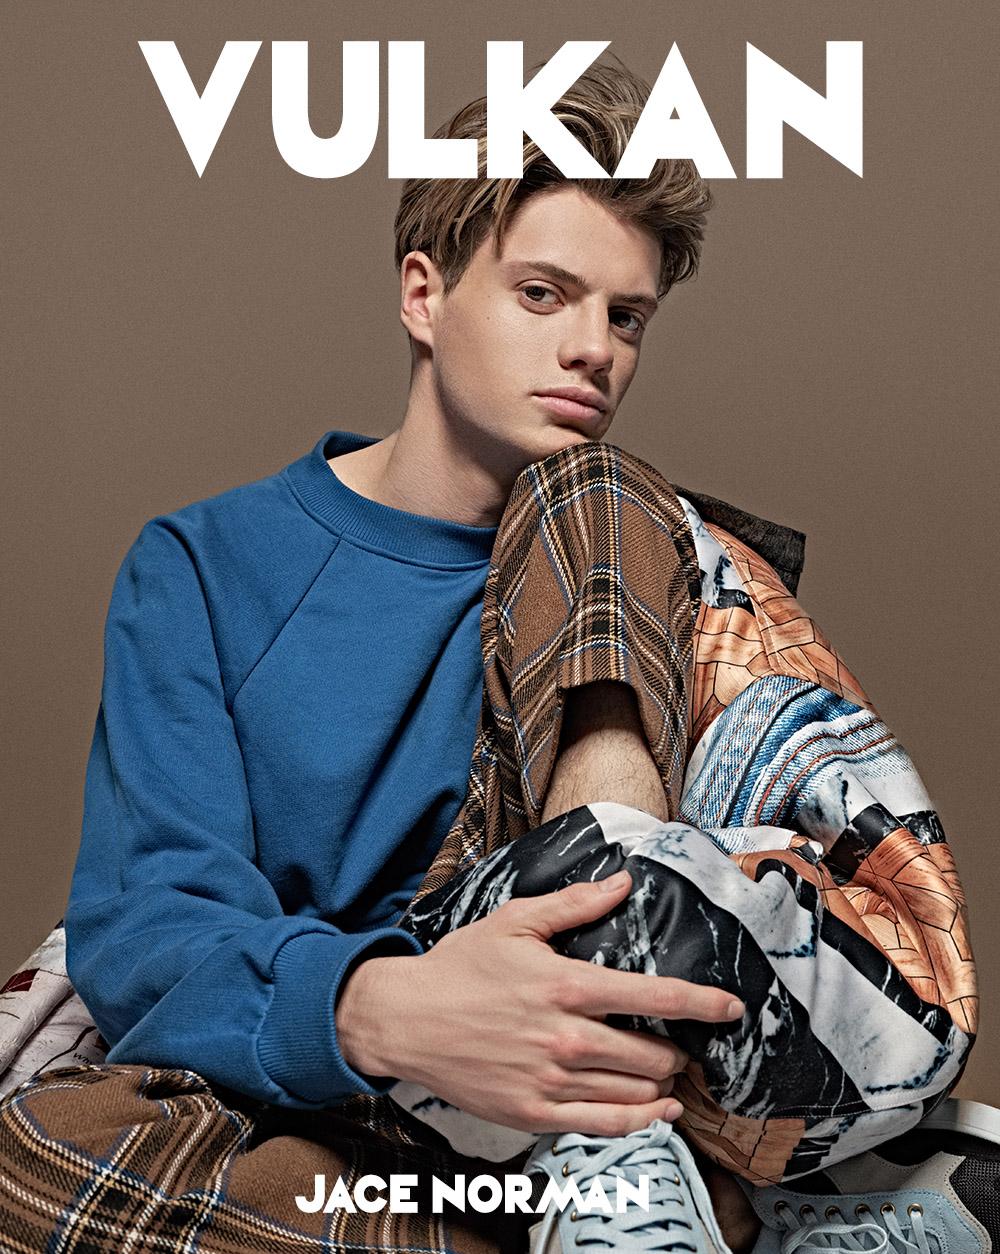 jace norman vulkan magazine